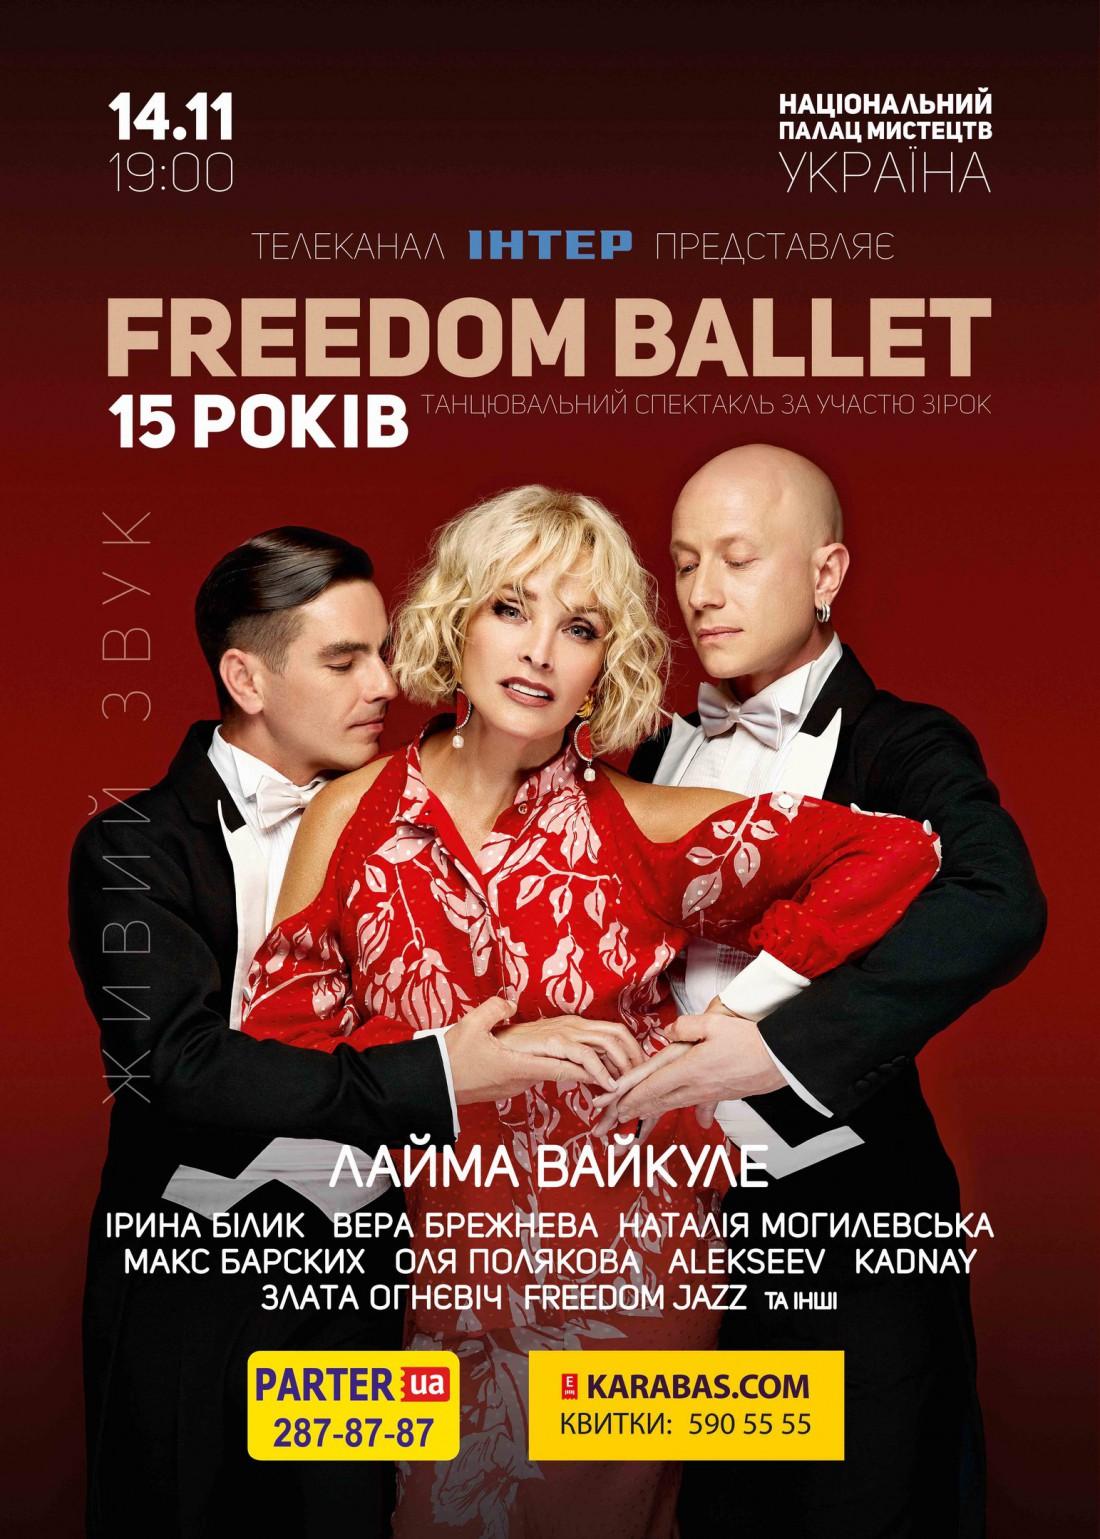 15-летие FREEDOM BALLET: непревзойденная Лайма Вайкуле